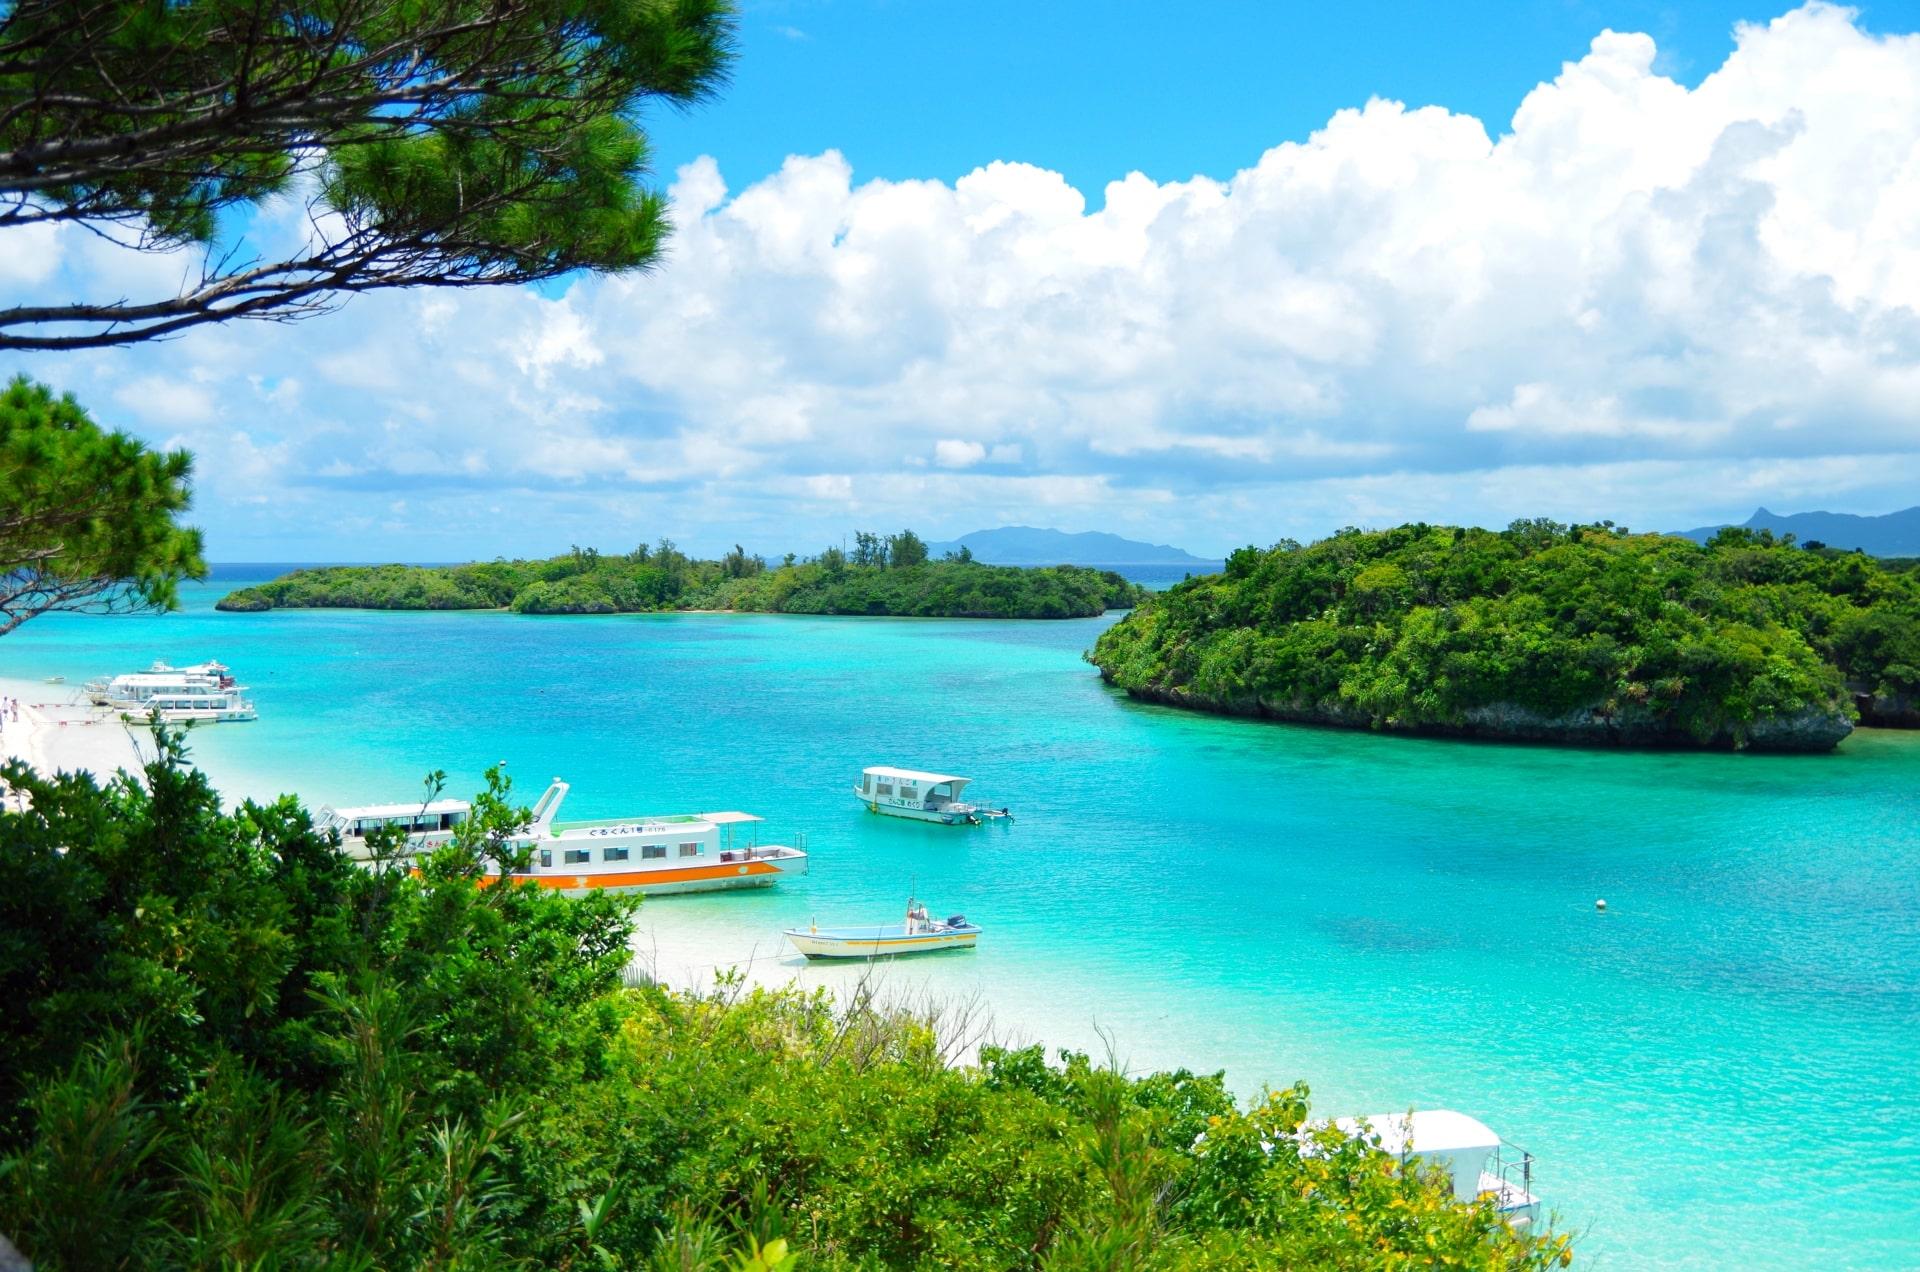 Kabira Bay in Ishigaki Island, Okinawa